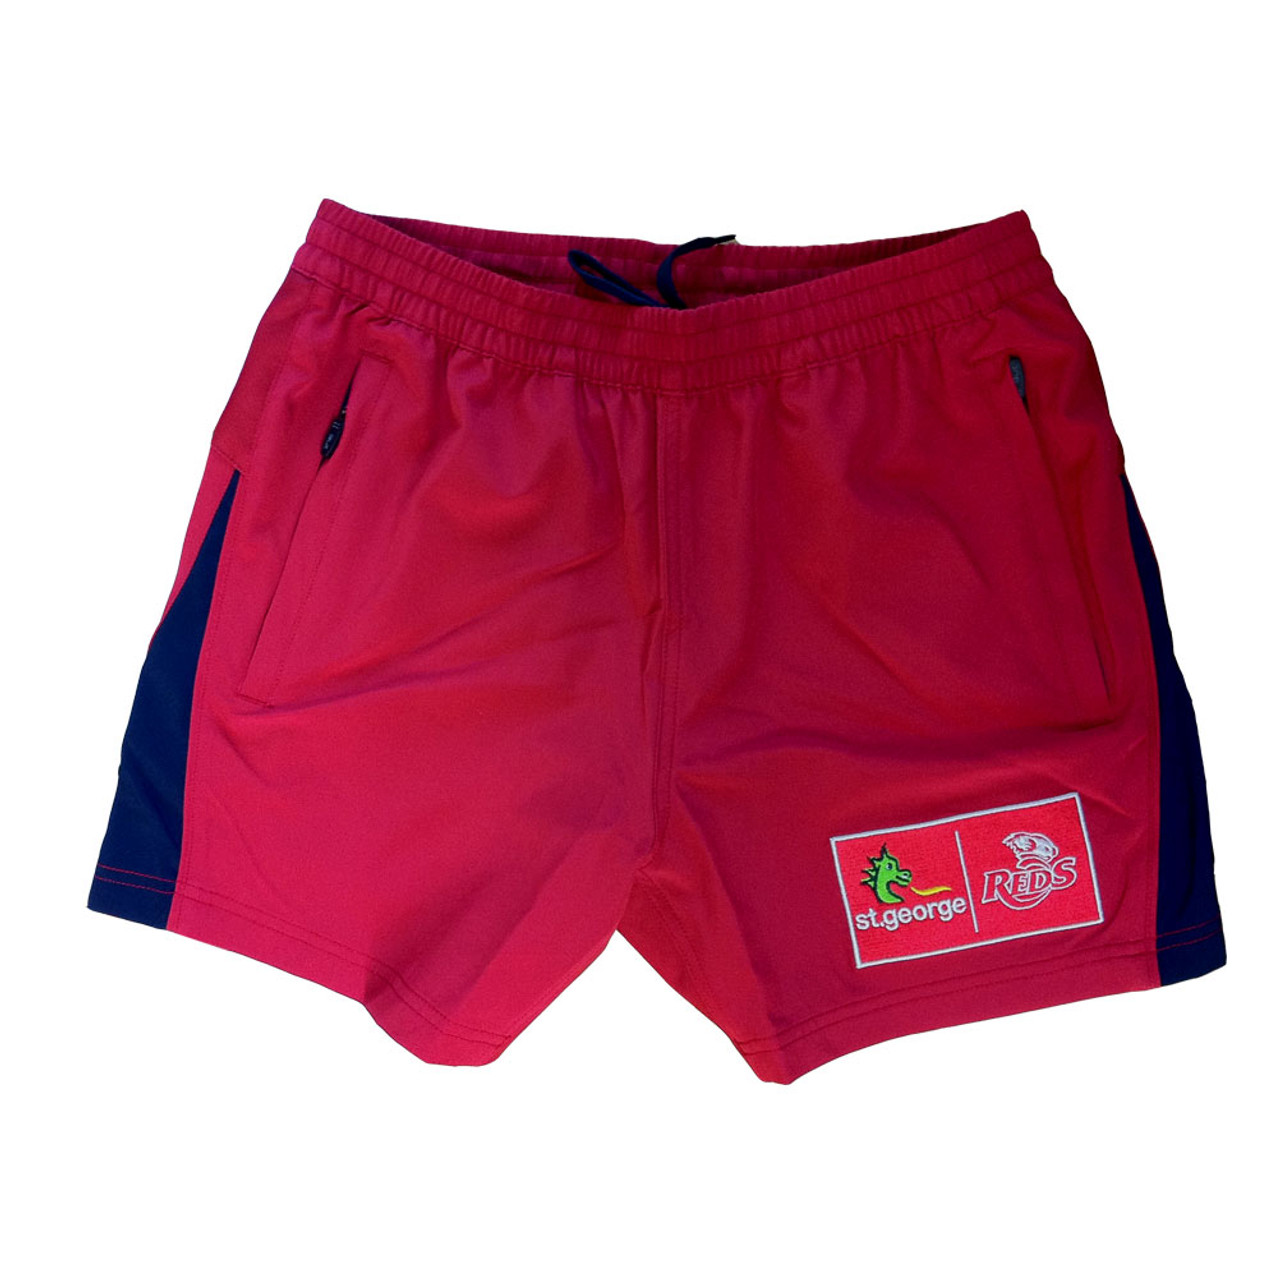 BLK queensland reds rugby training / gym shorts